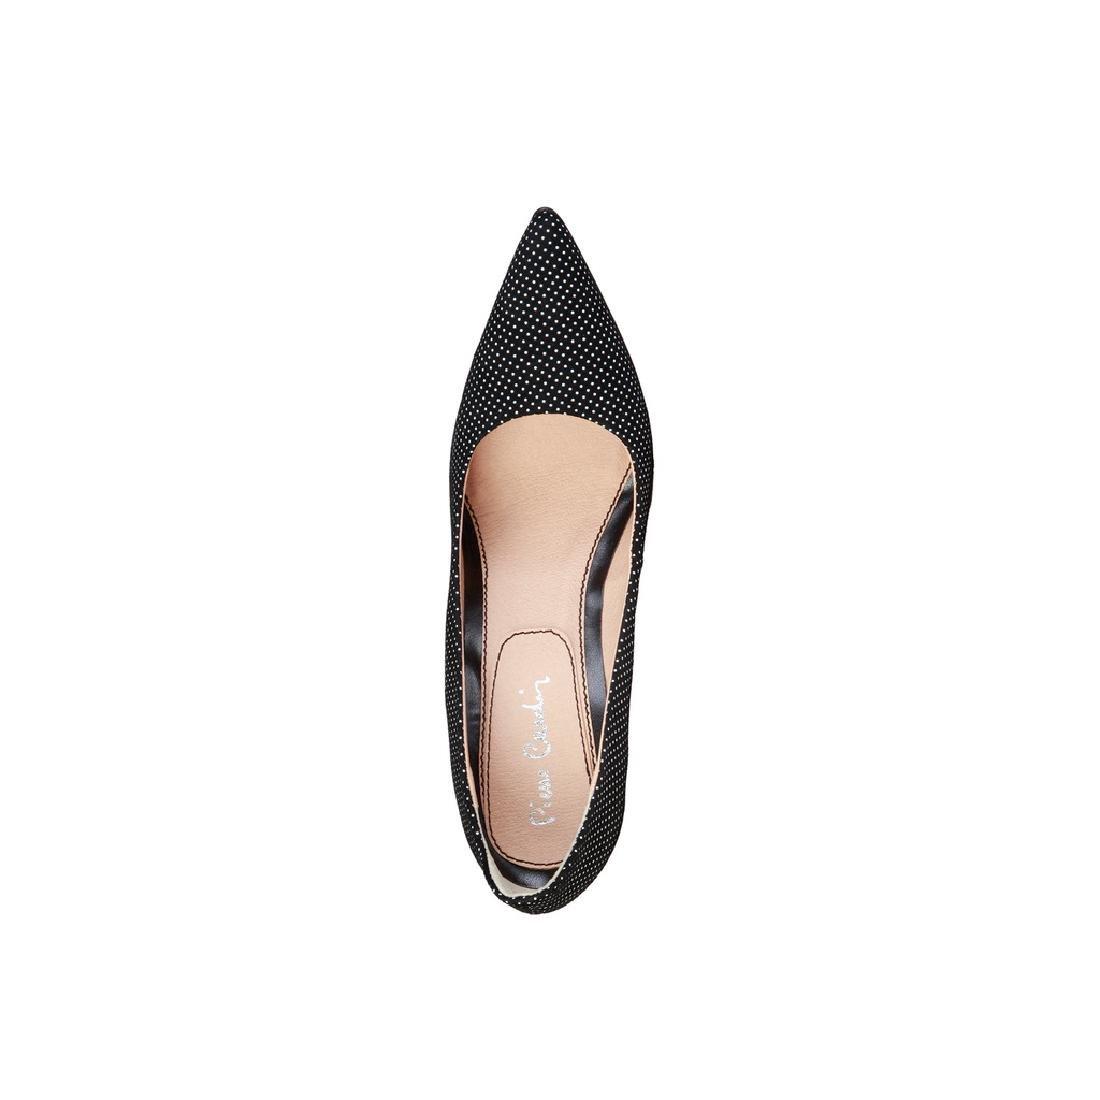 New Women's Pierre Cardin High Heel Pumps Shoes US 8.5 - 5